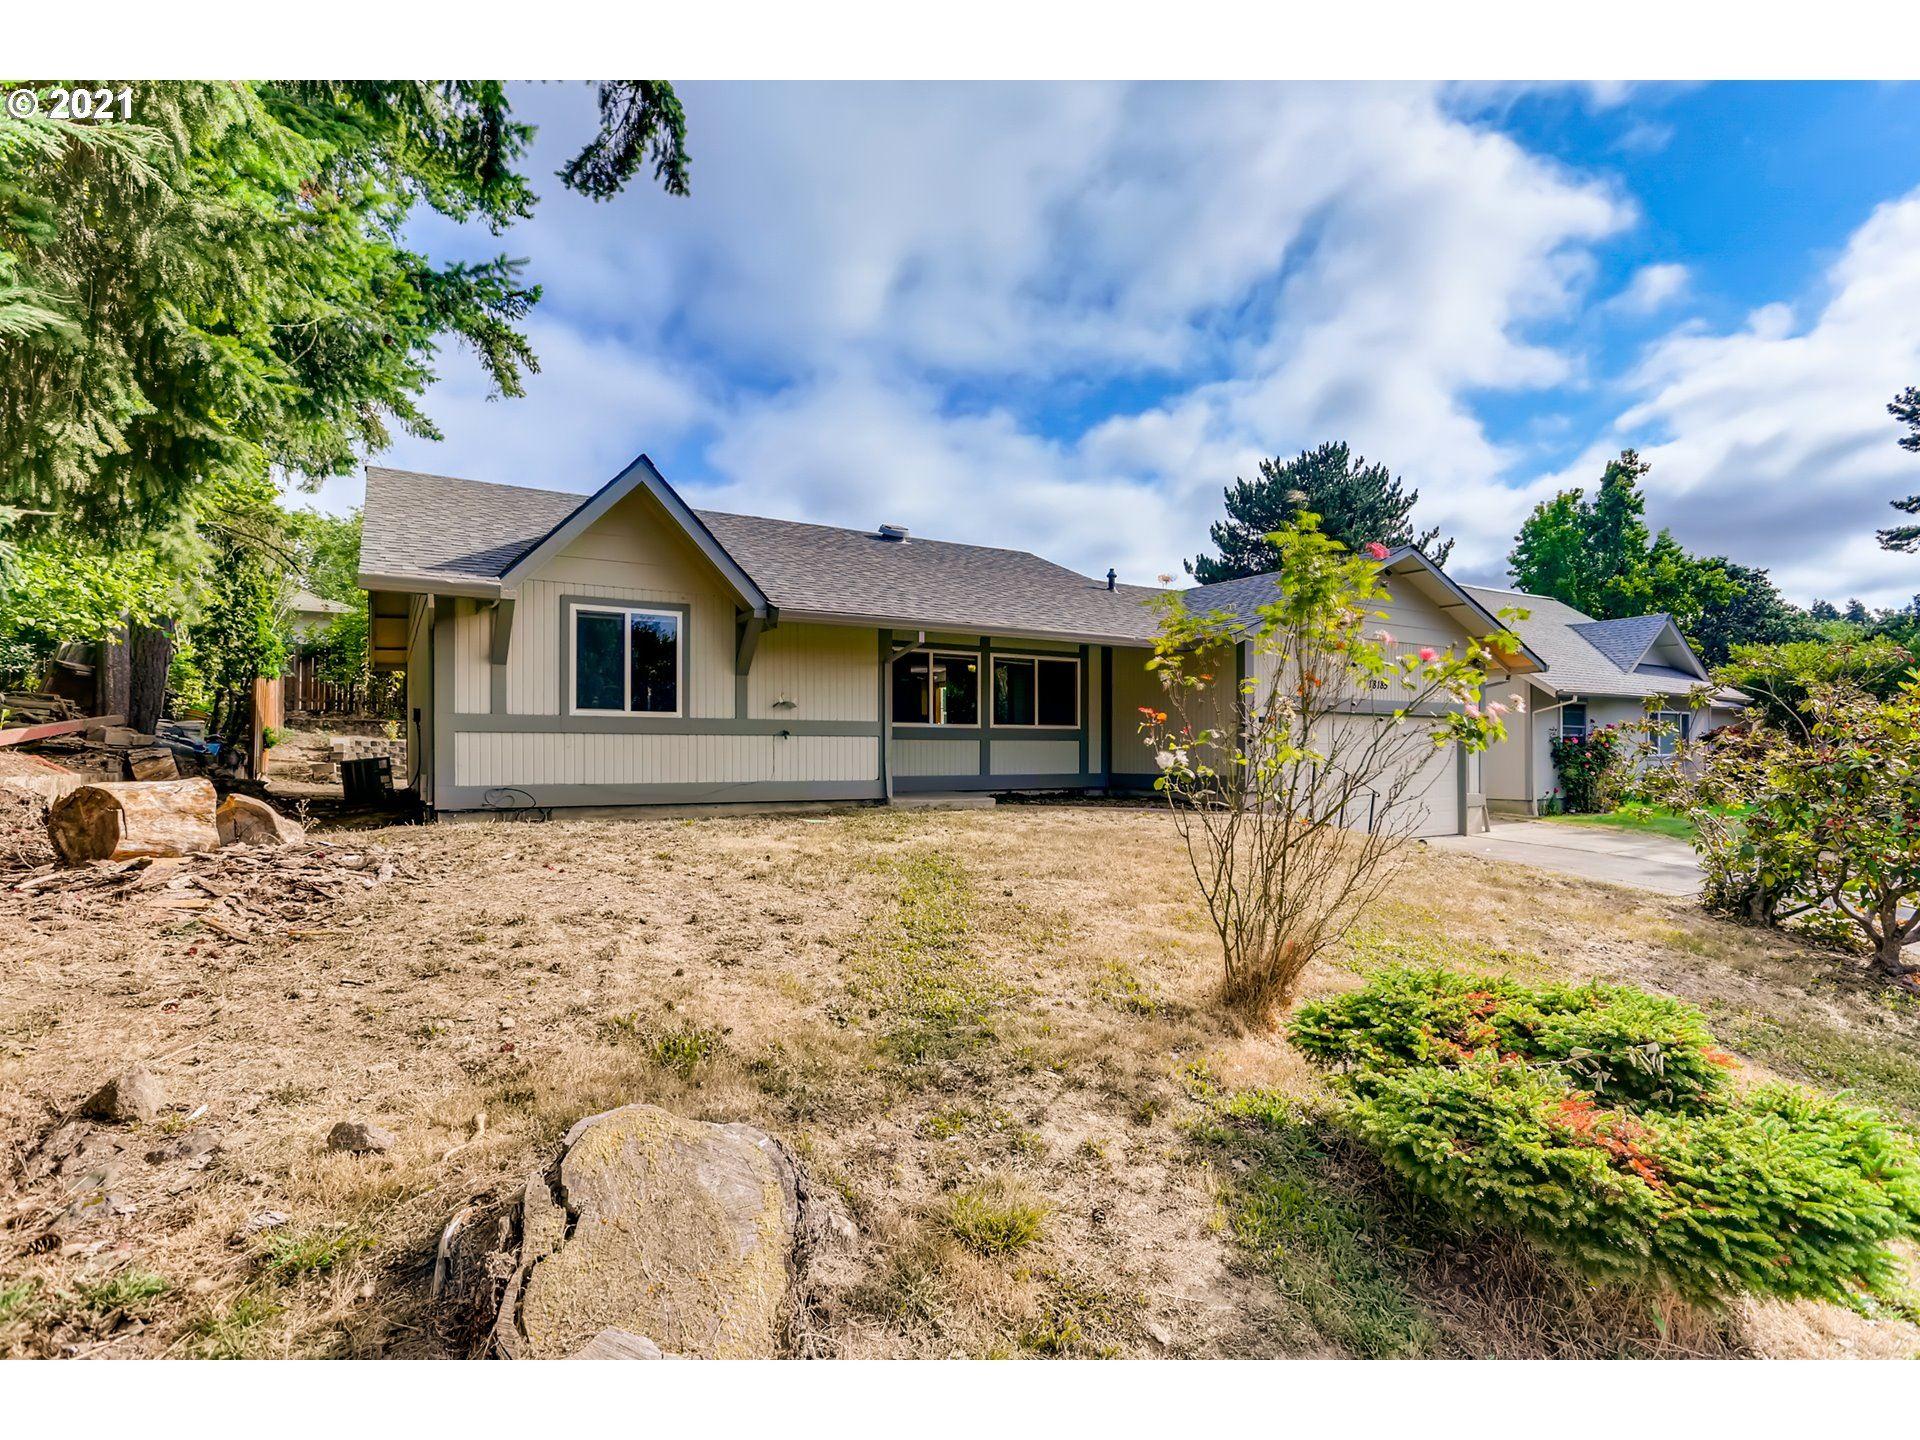 18185 SW SALIX RIDGE ST, Beaverton, OR 97006 - MLS#: 21287337